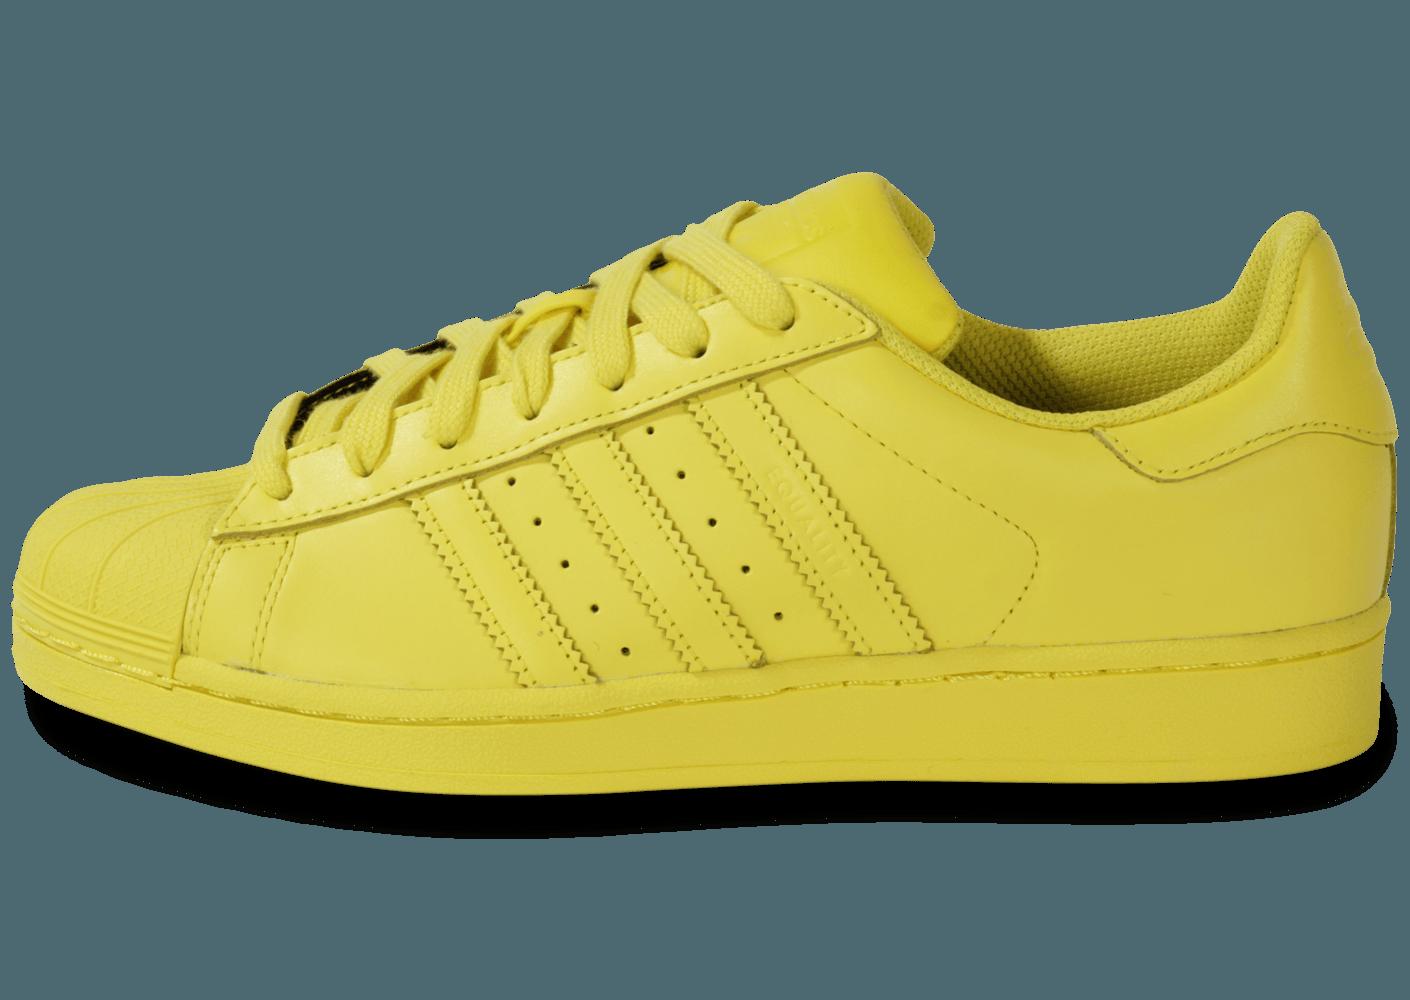 adidas superstar jaune Avis en ligne